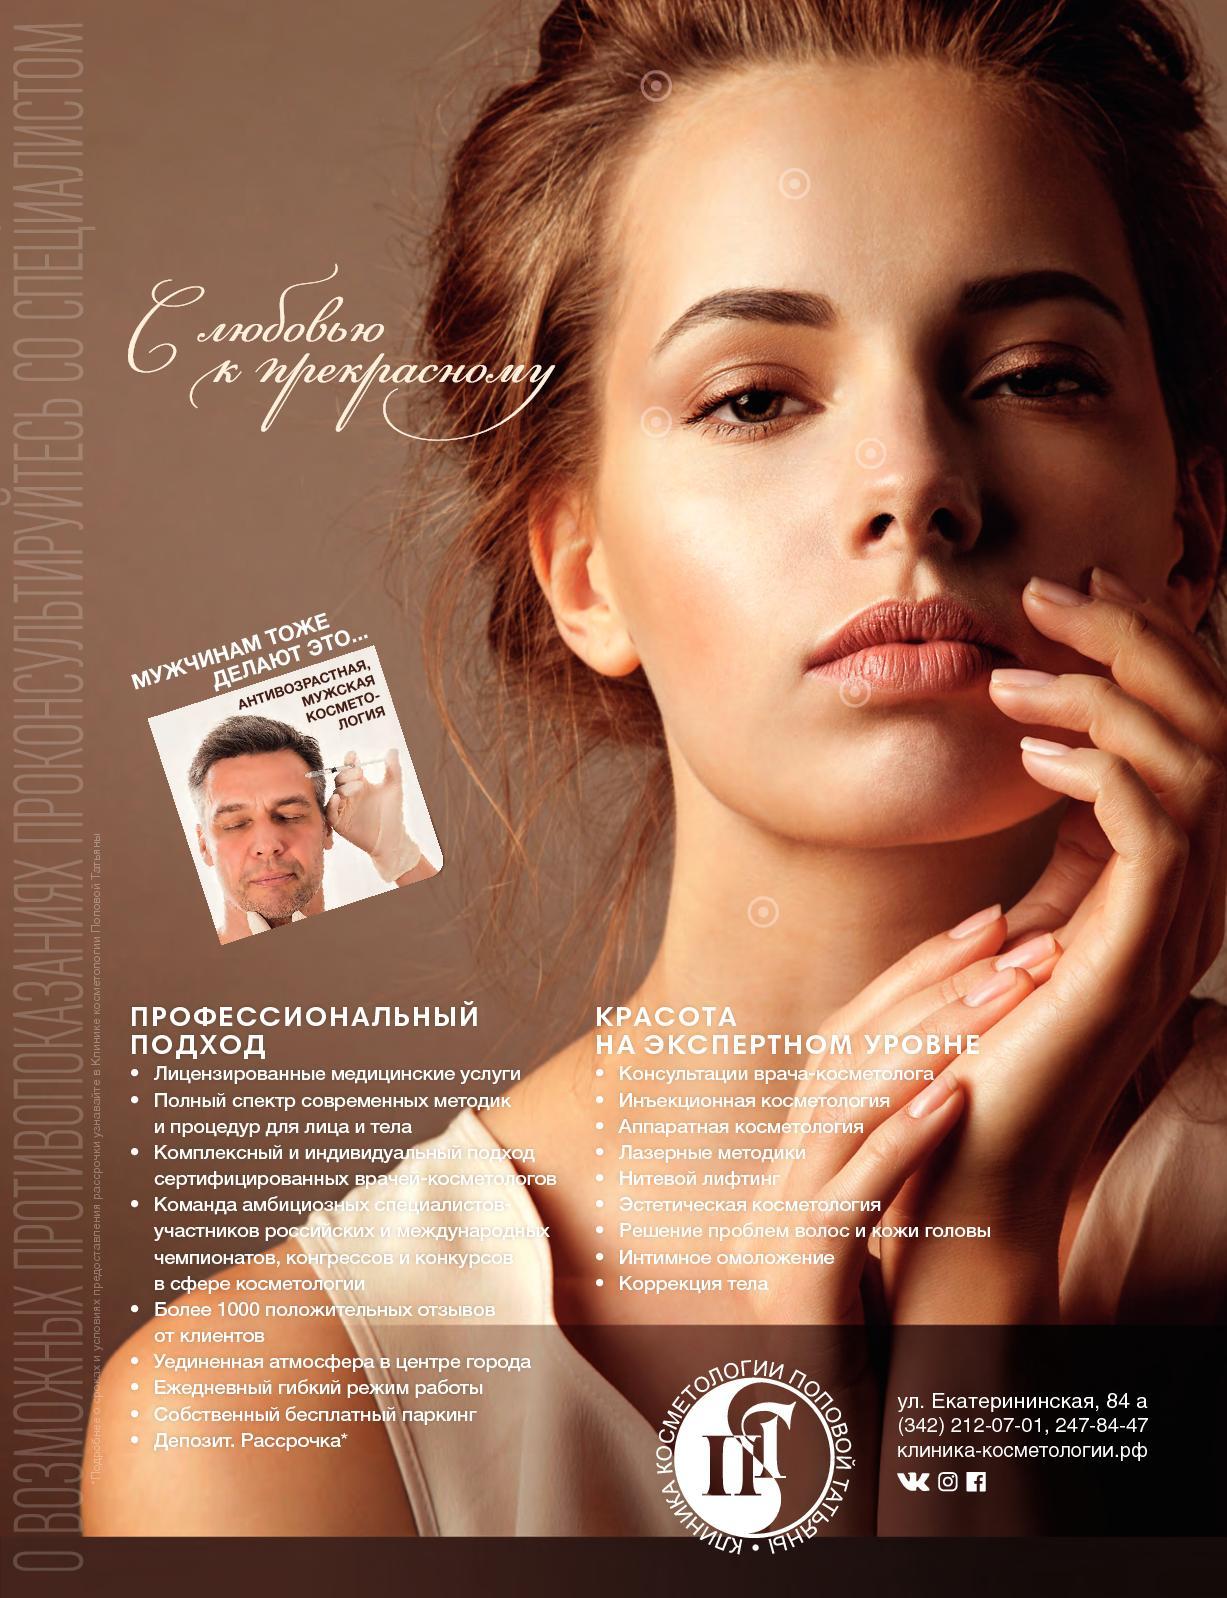 d522dfd95ed8 Shopping Guide «Я Покупаю. Пермь», ноябрь 2017 - CALAMEO Downloader